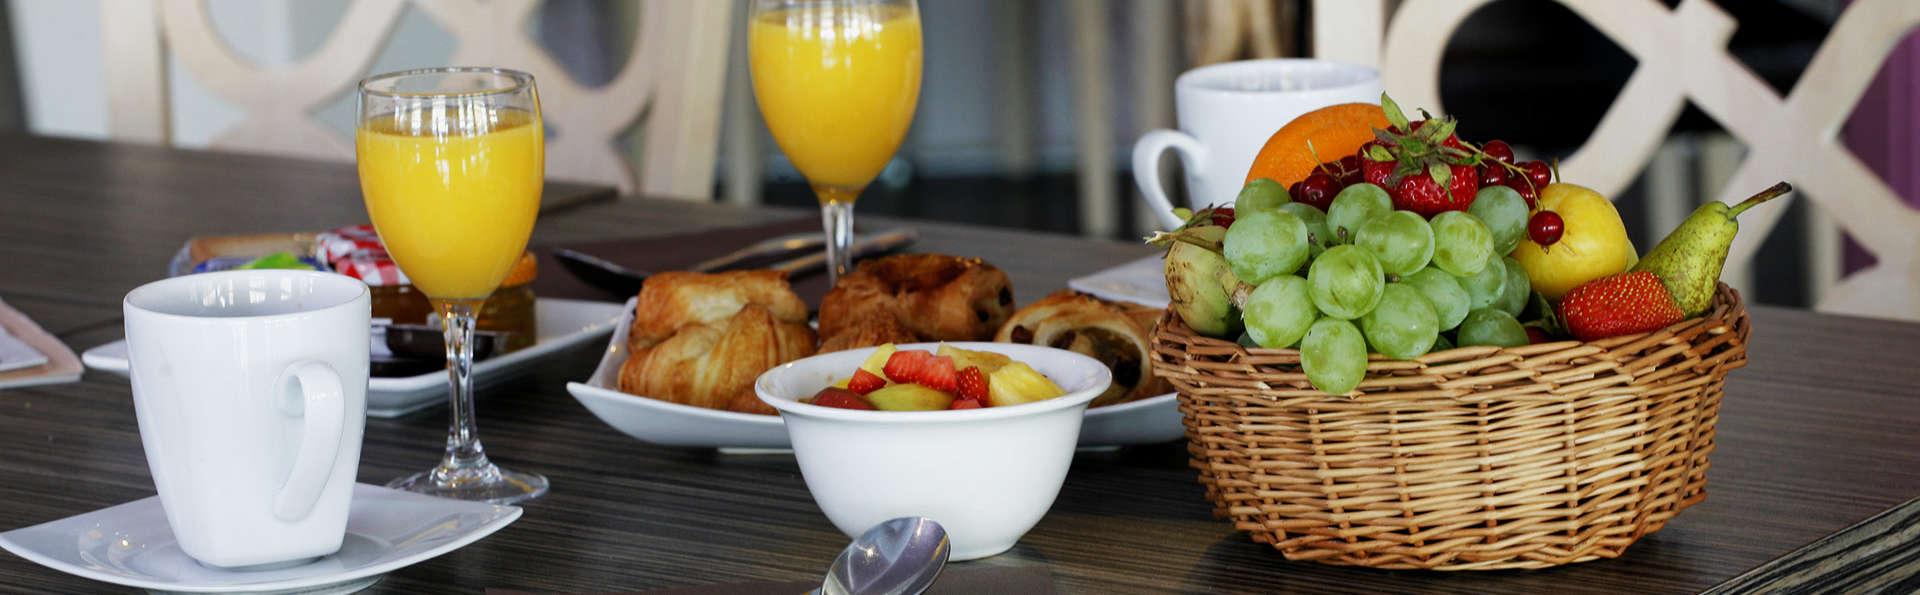 QUALYS-HOTEL Golf de l'Ailette - EDIT_breakfast.jpg